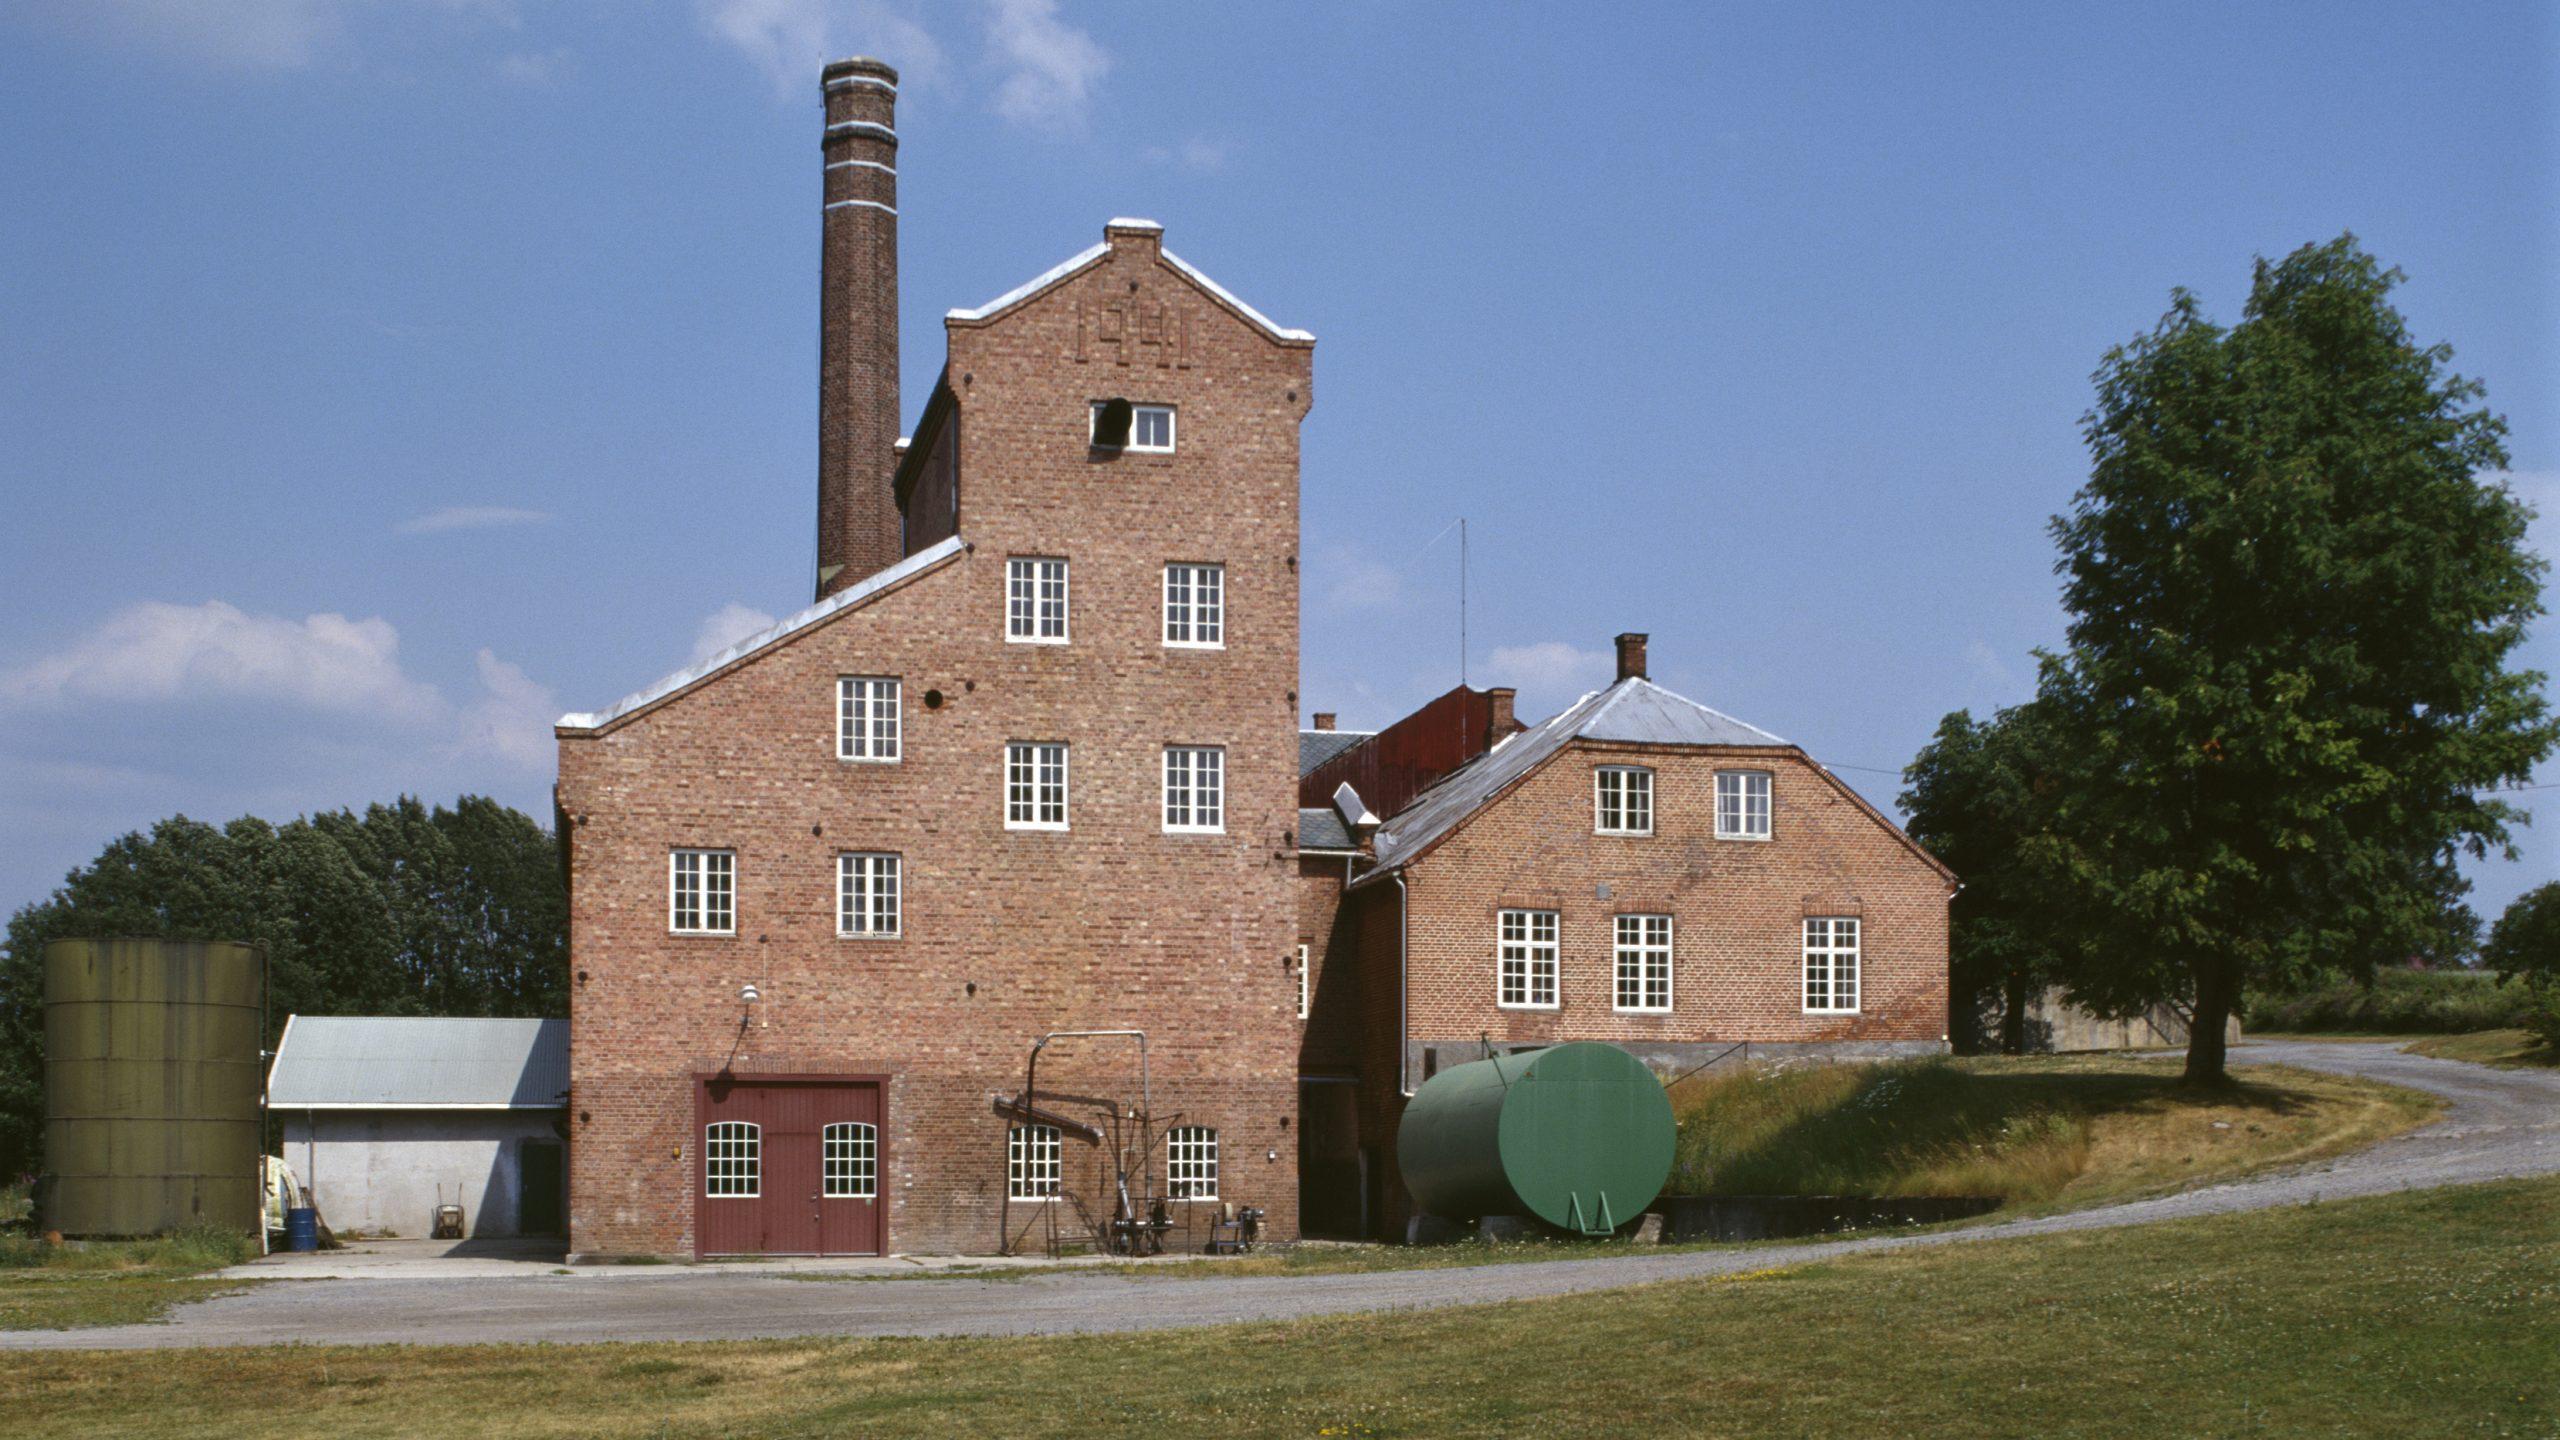 Bilde av Atlungstad brenneri, Stange, Hedmark. Foto: Birger Lindstad / Riksantikvaren